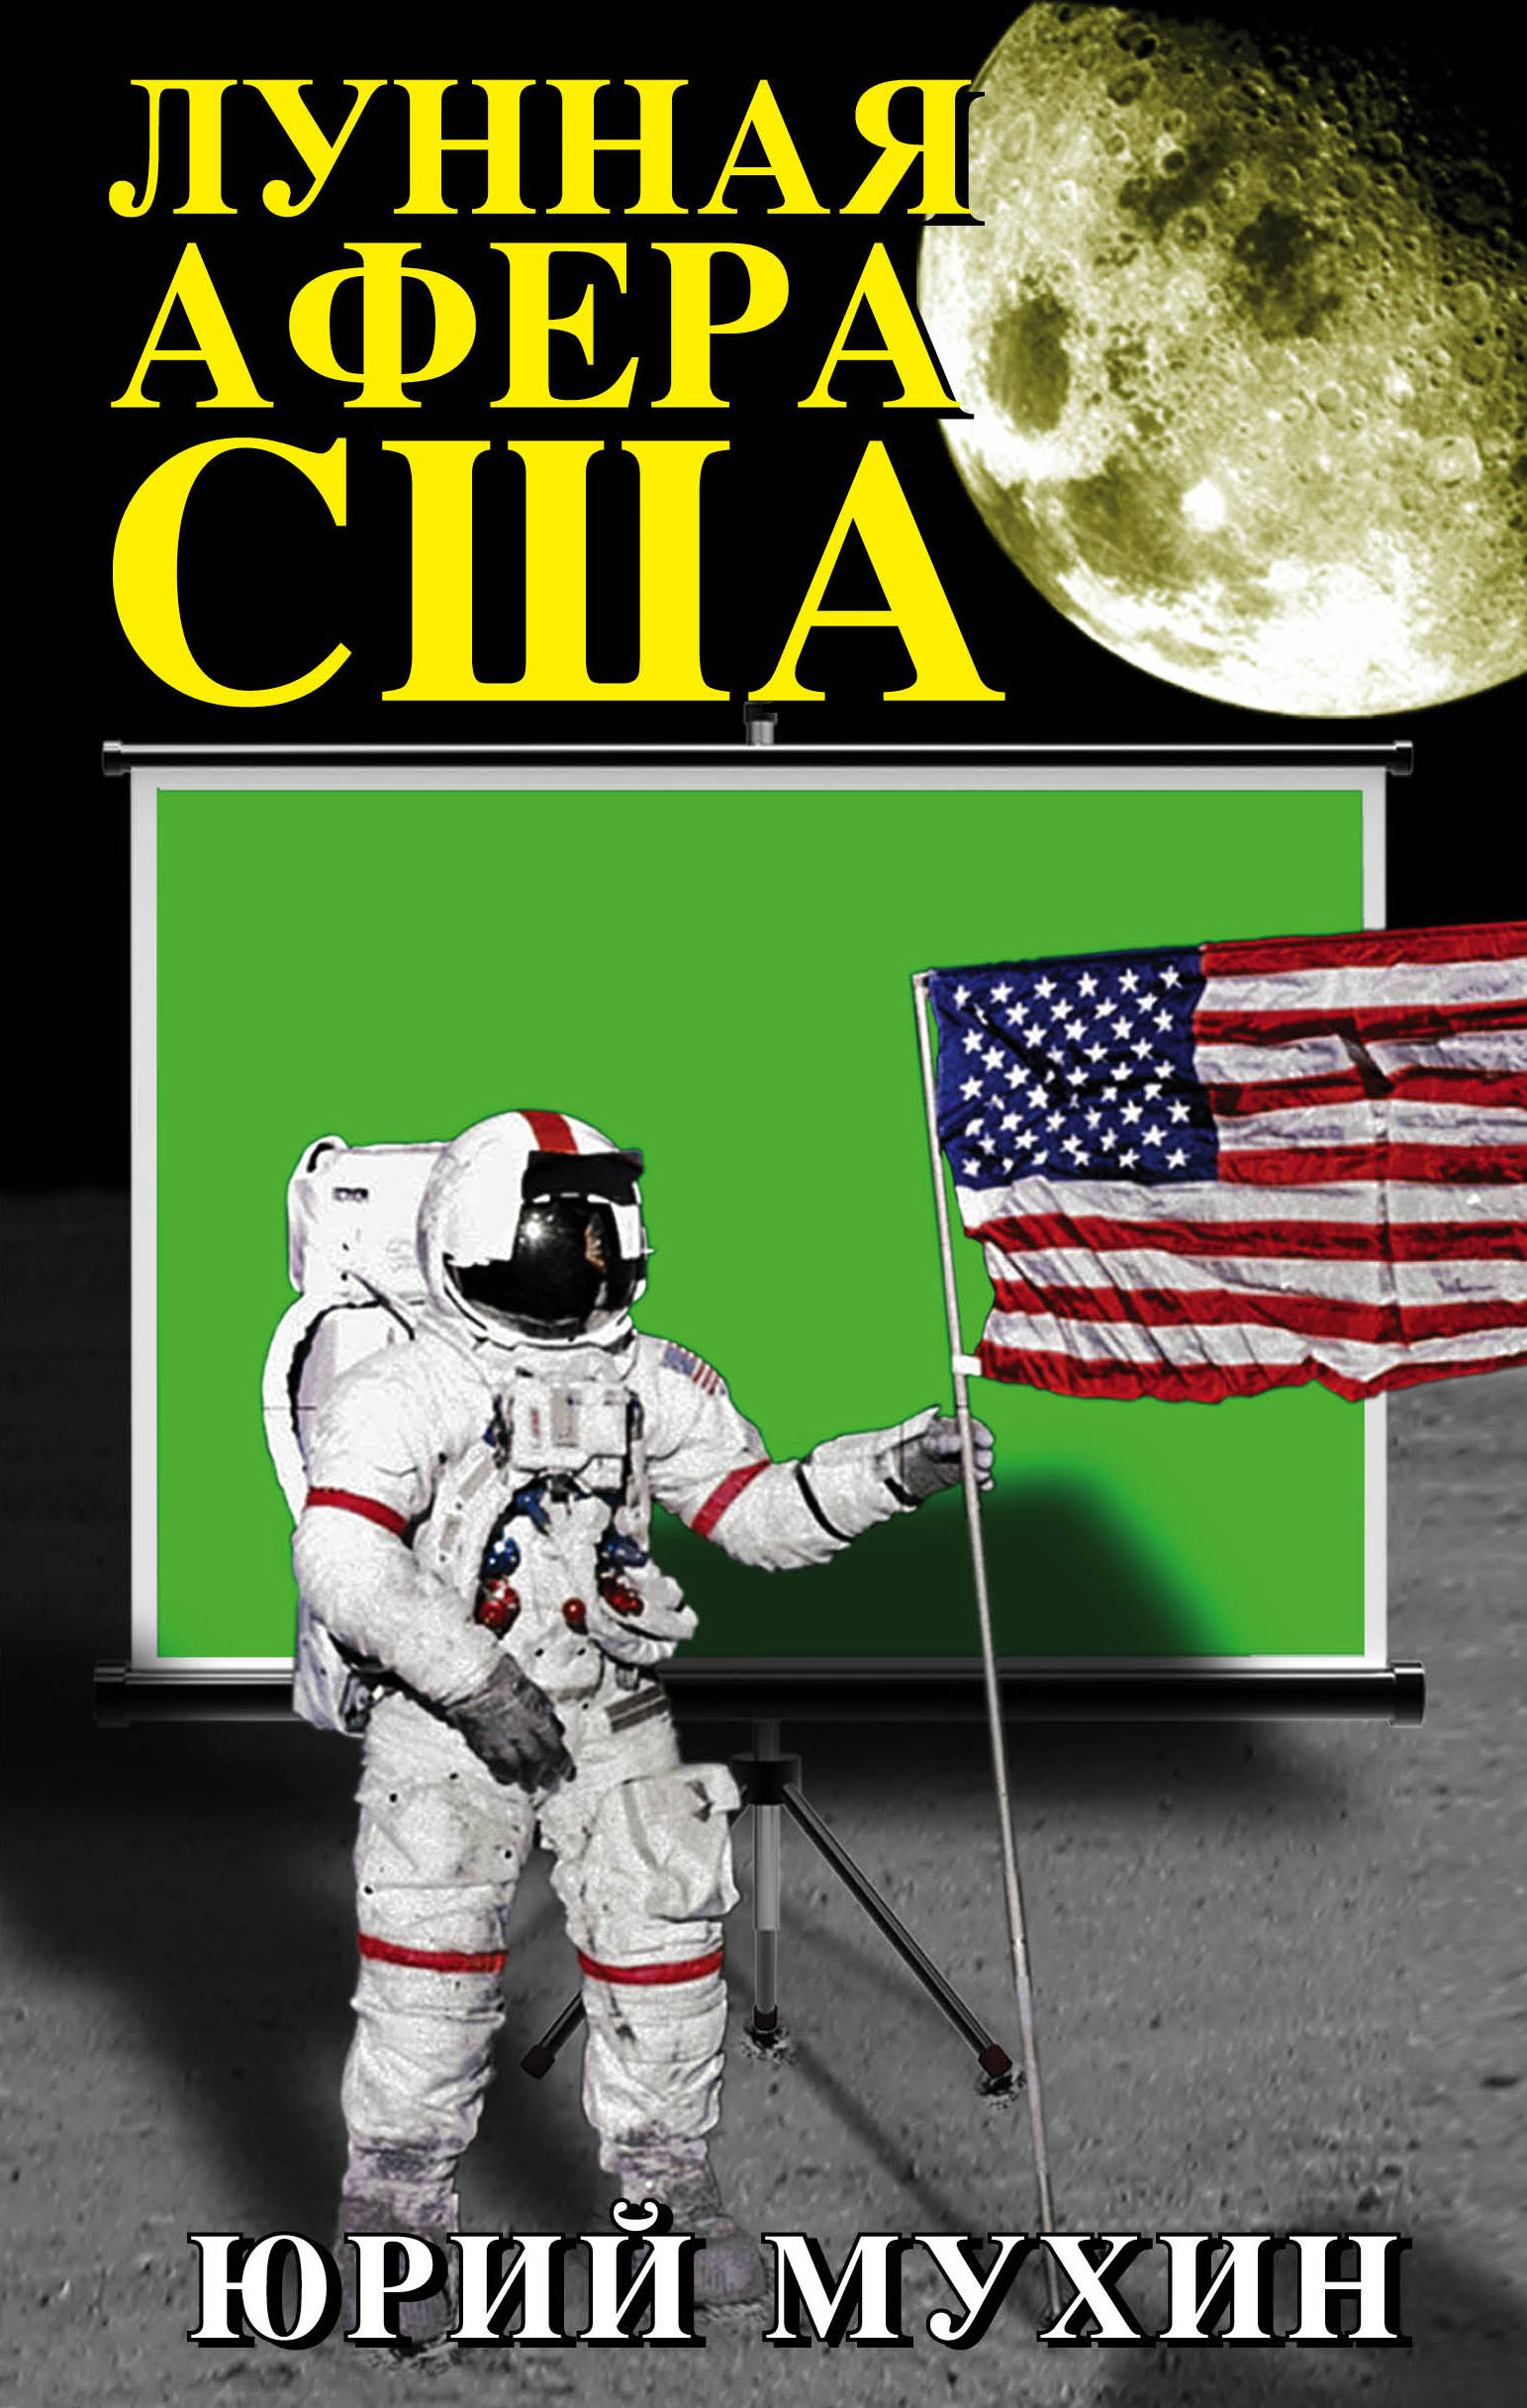 Юрий Мухин Лунная афера США ISBN: 978-5-9955-0951-6